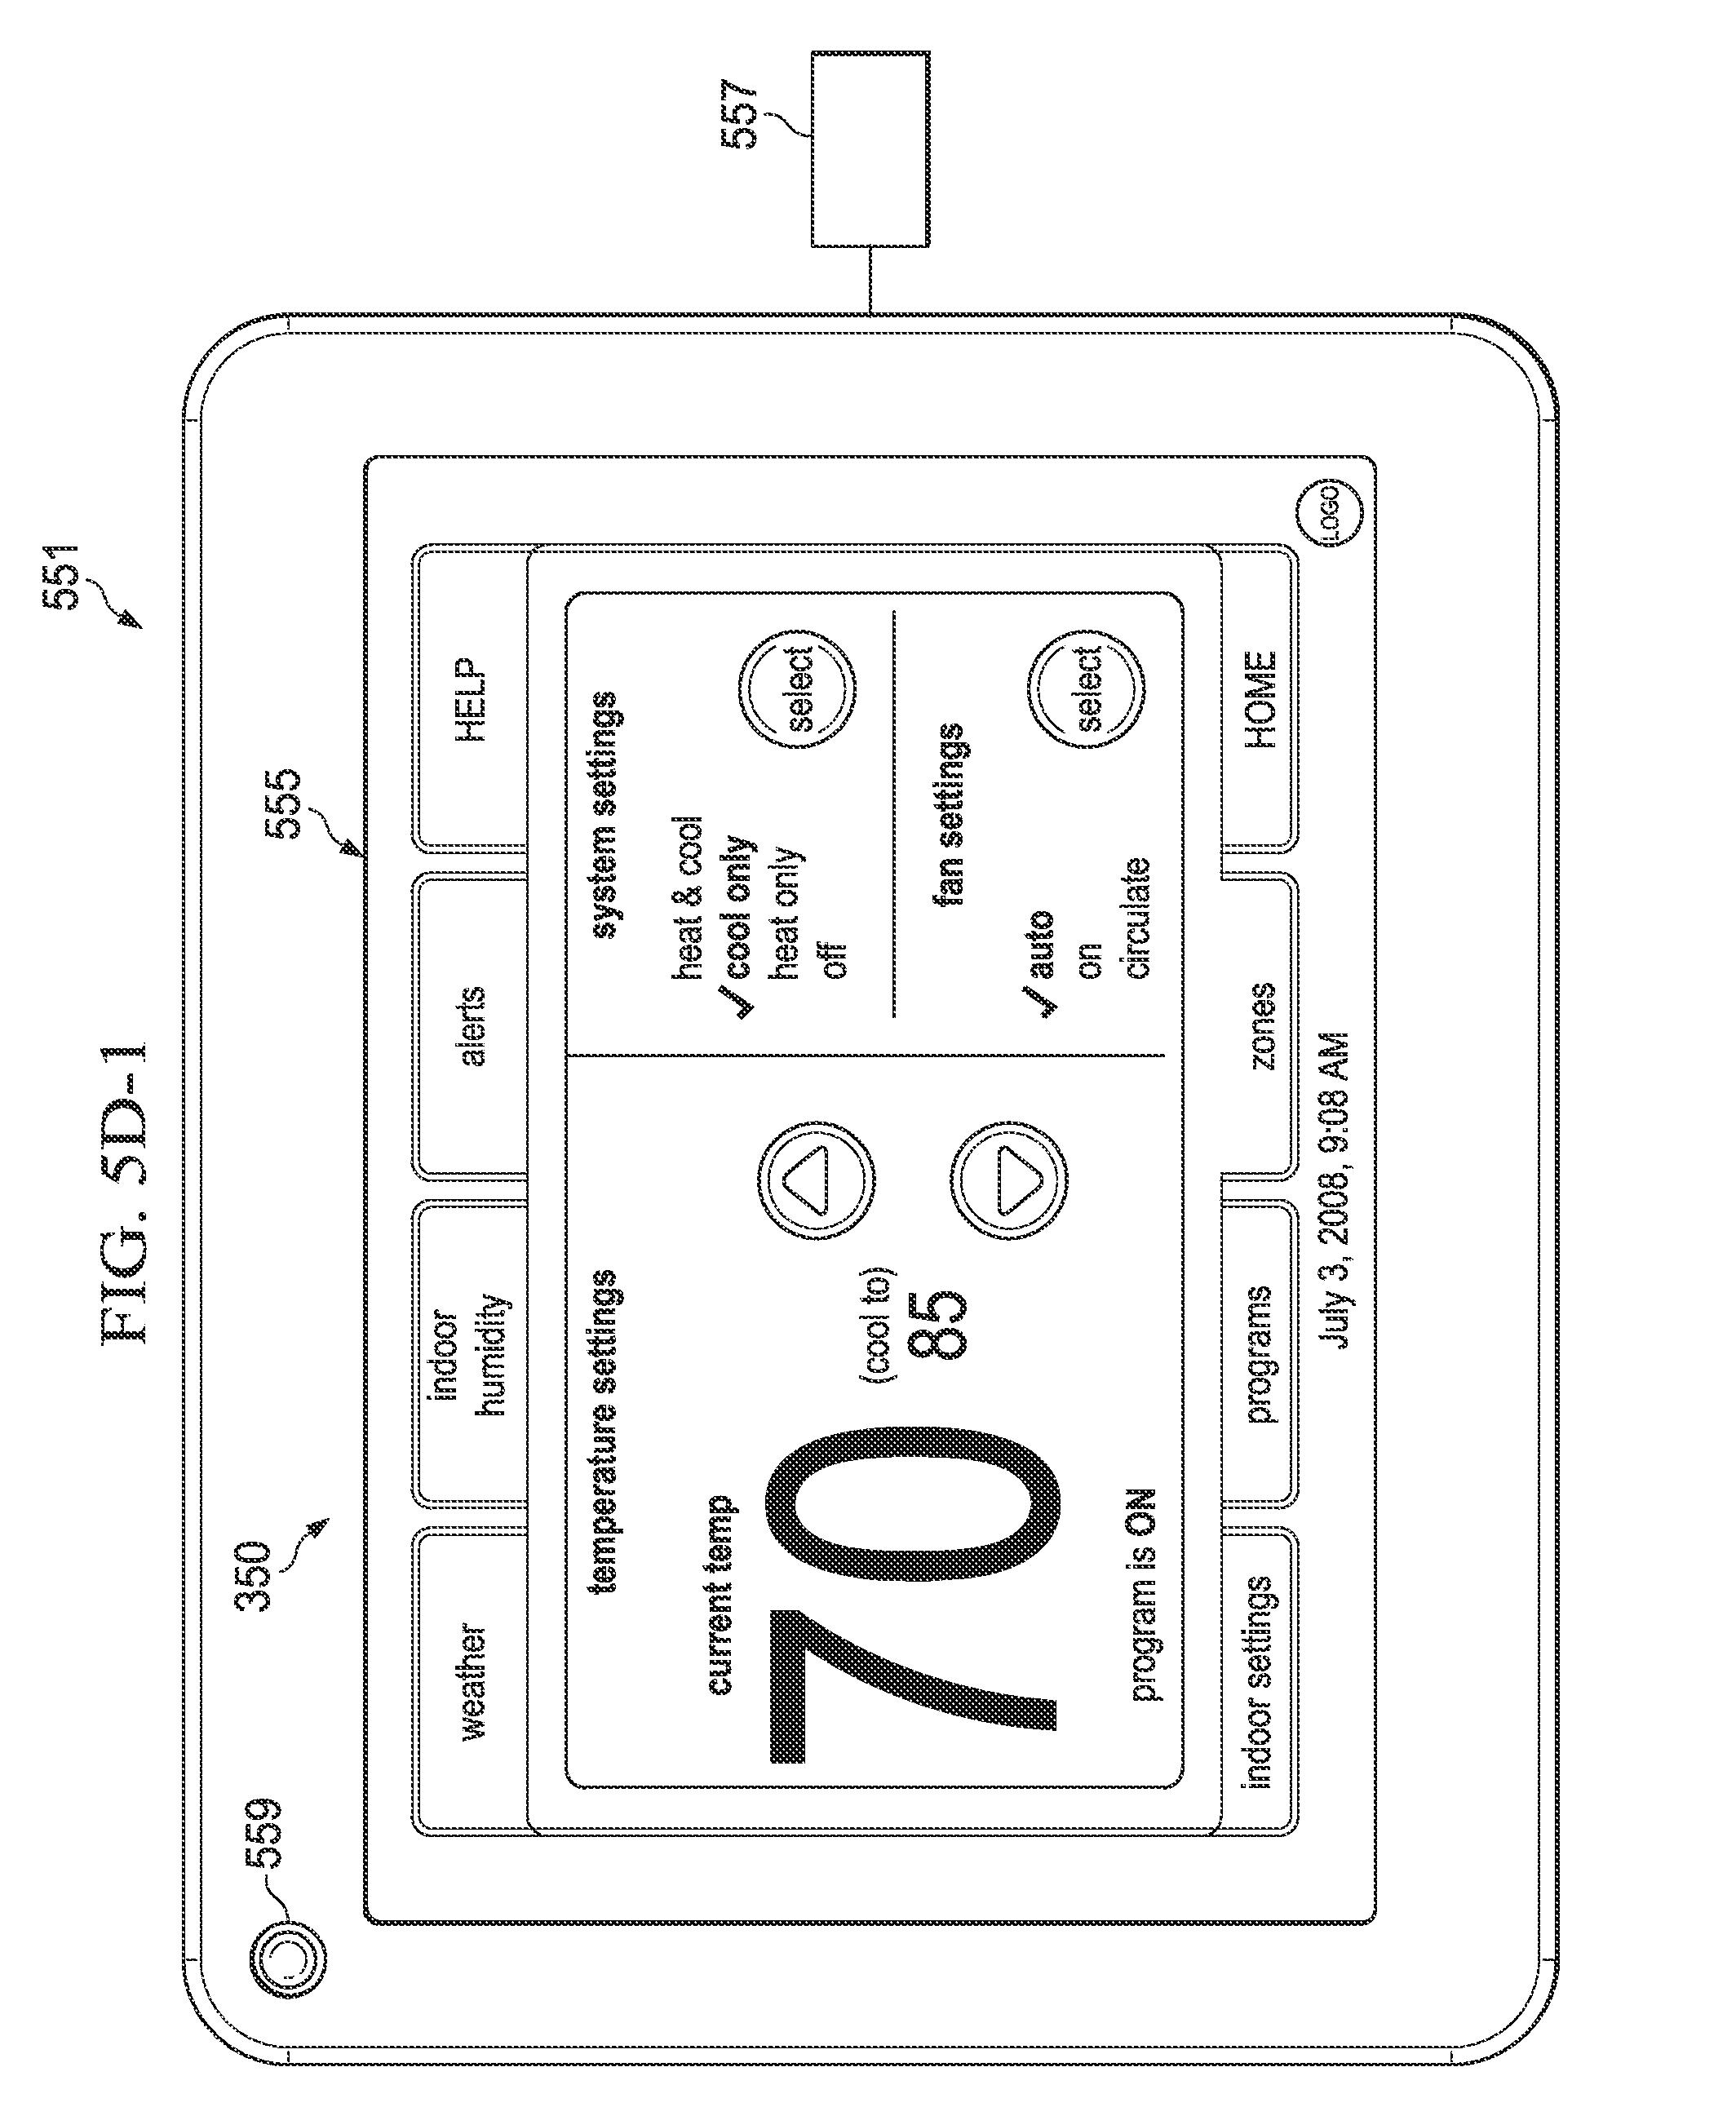 Patent Us 8694164 B2 Fan Controller 555 Temperature Circuit Ac Drill Speed